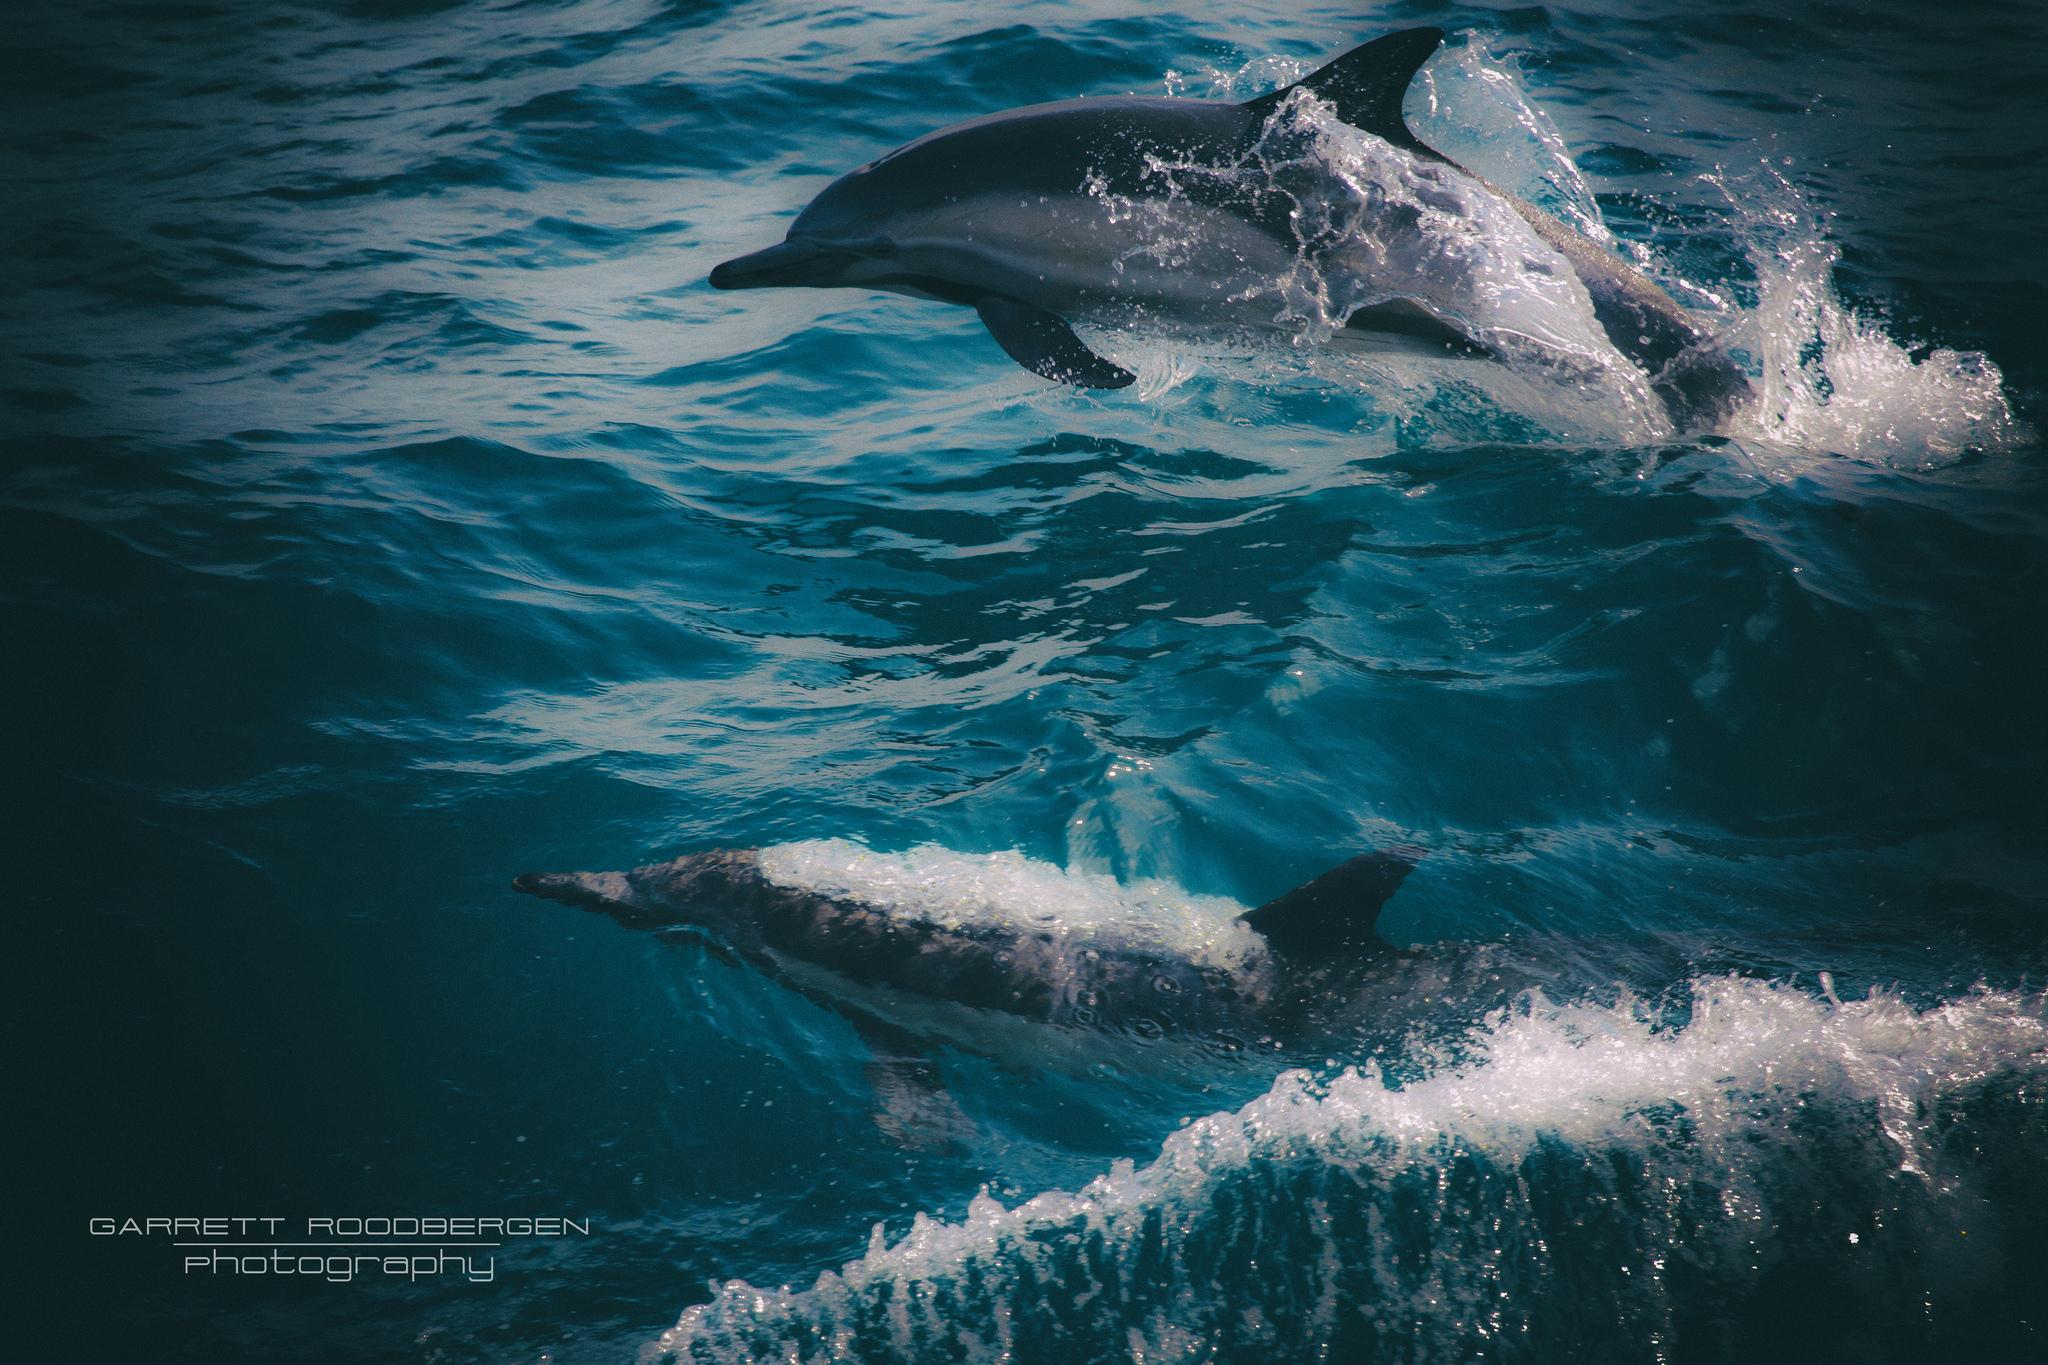 Free as a Dolphin #ocean #wildlife #freedom #summerbreeze